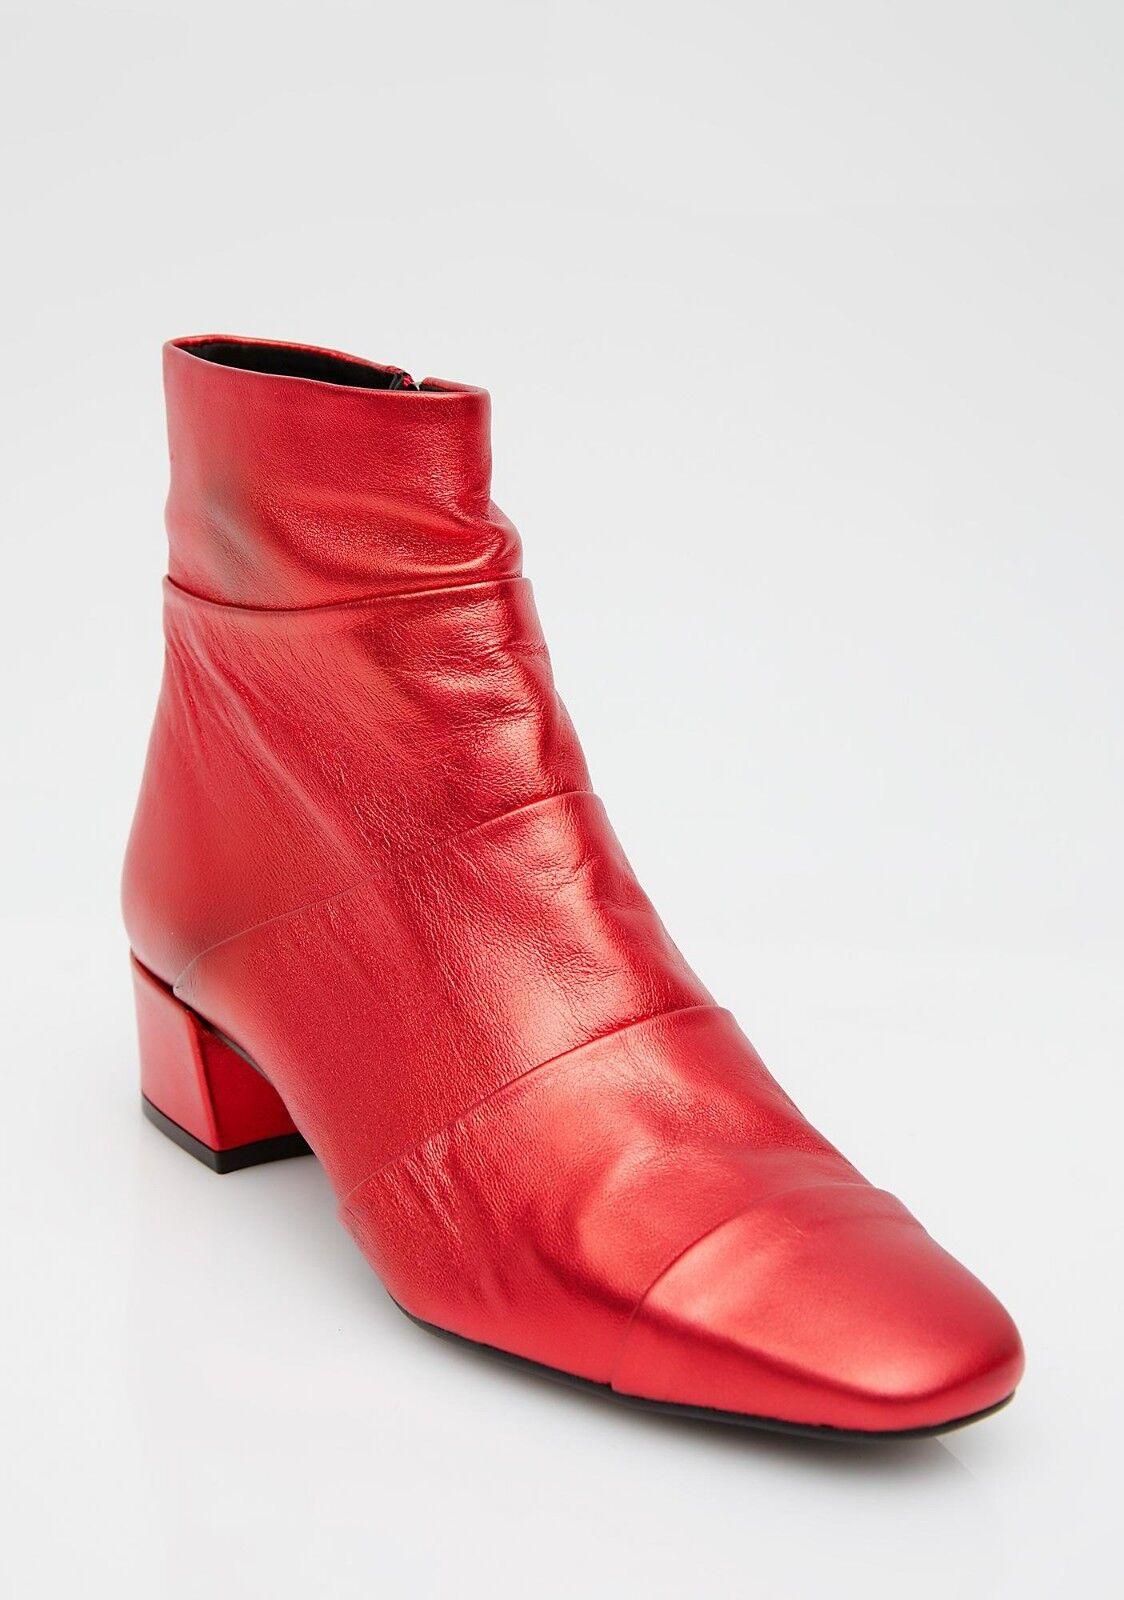 CROSSWALK rouge CENTURY rouge METALLIC démarrageIES URBAN OUTFITTERS Taille 9